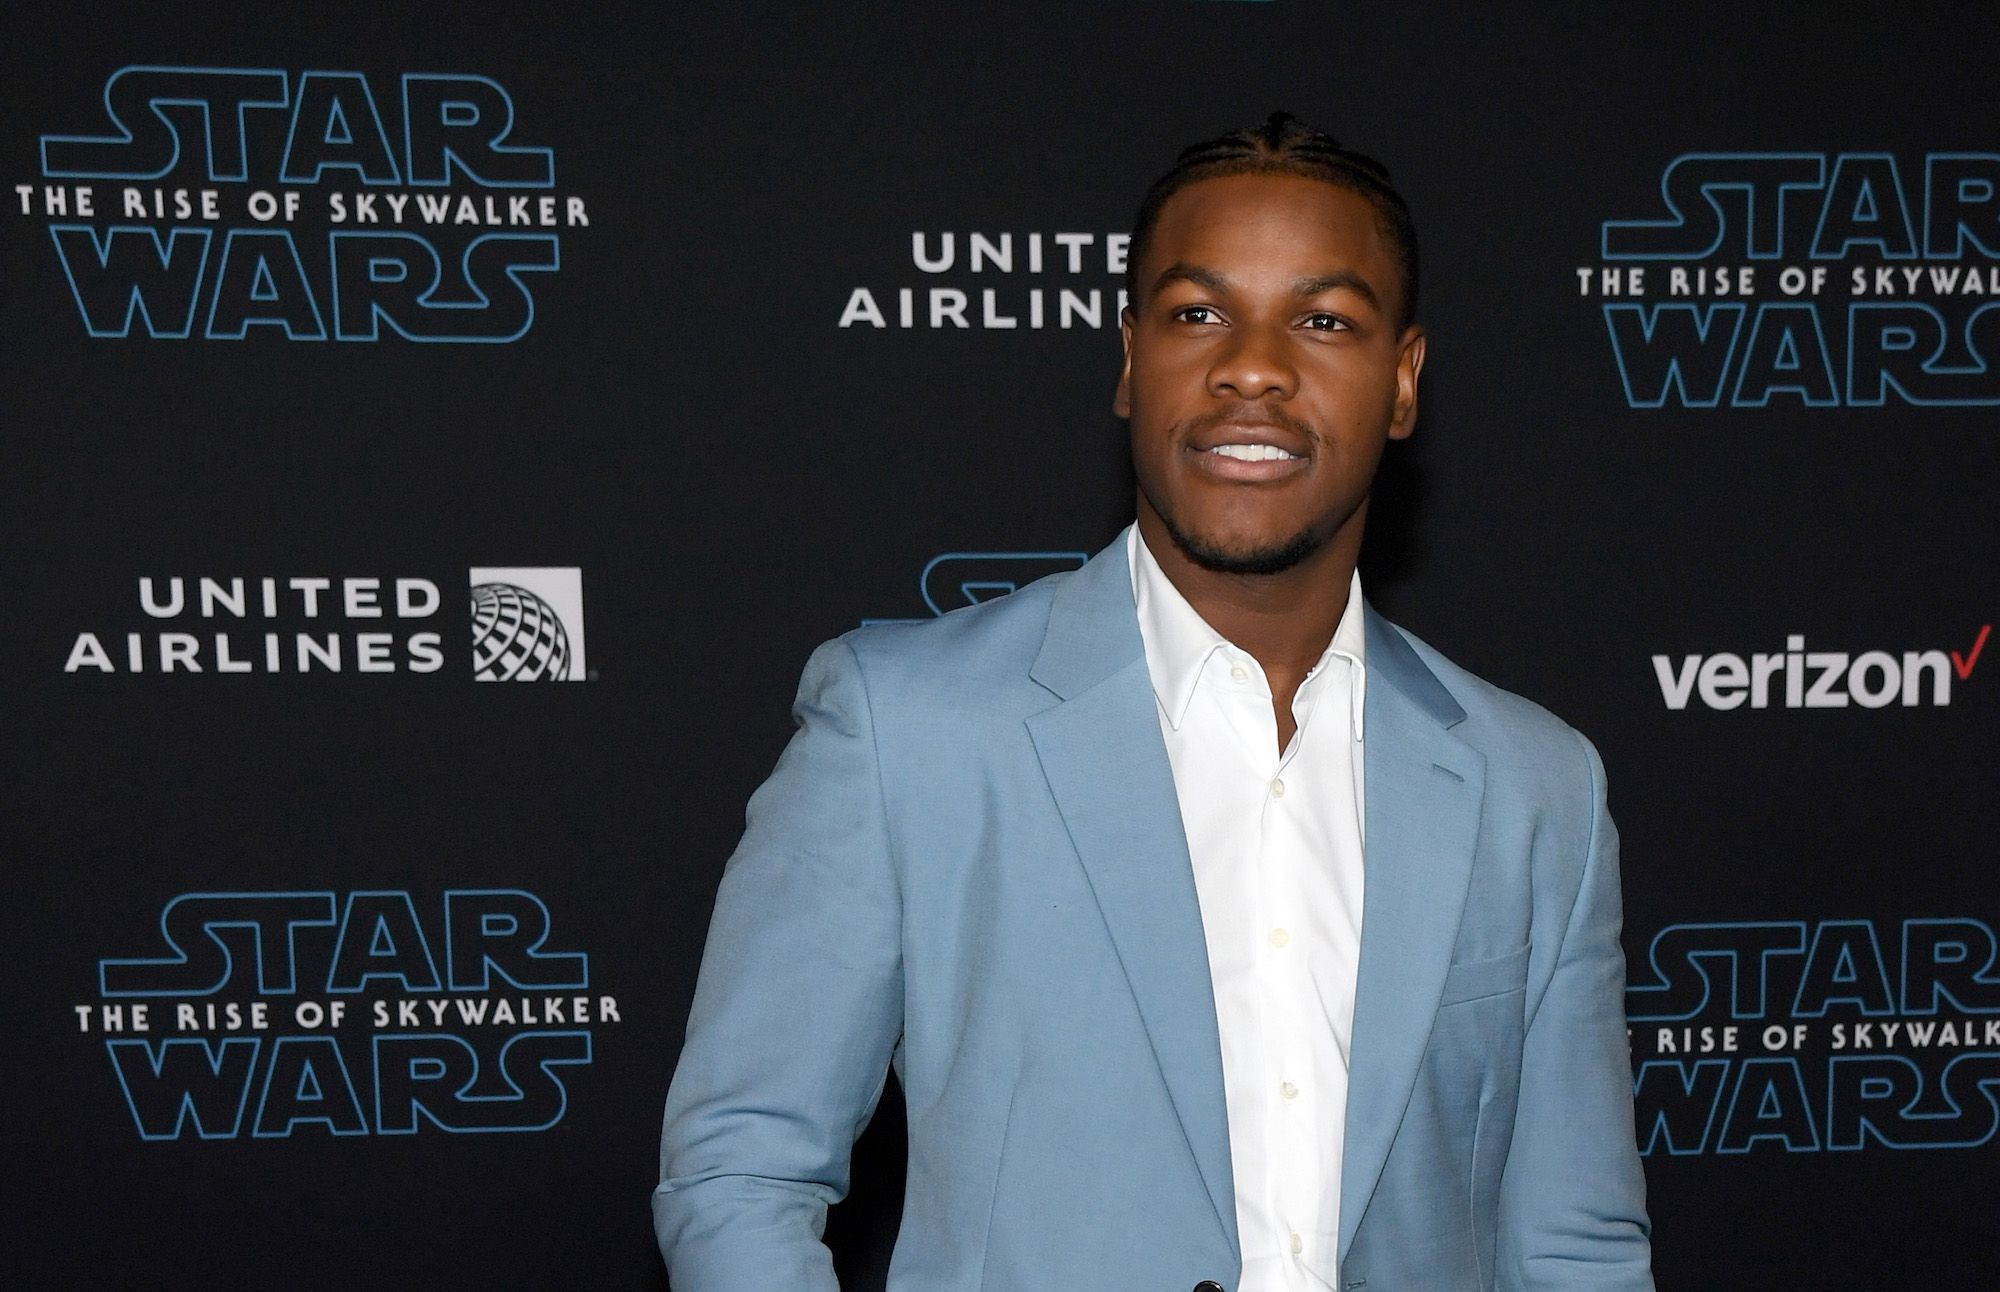 John Boyega at the premiere of Disney's 'Star Wars: The Rise of Skywalker' on Dec. 16, 2019.